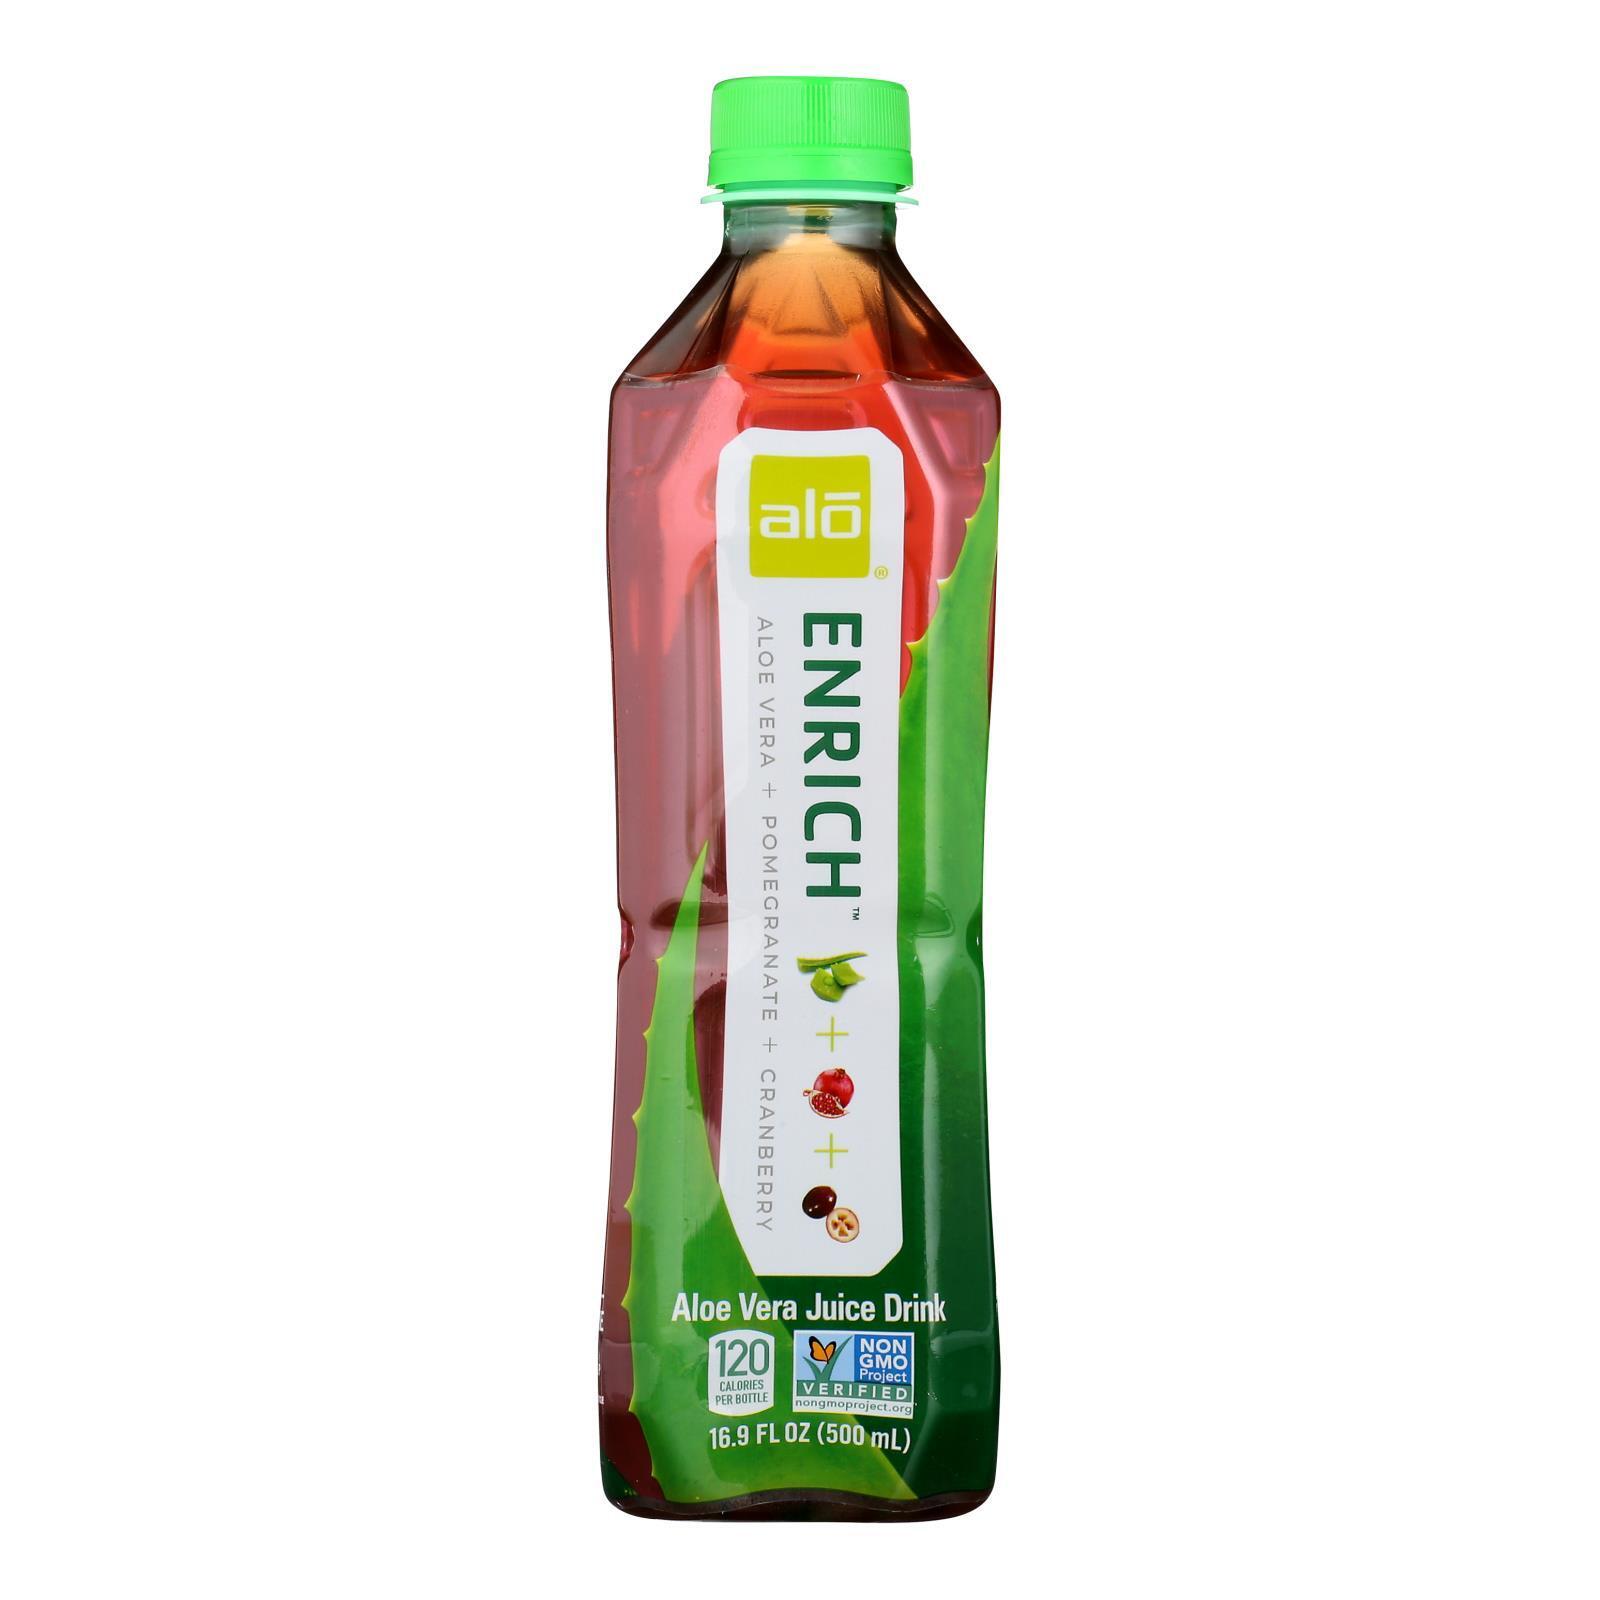 Alo Original Enrich Aloe Vera Juice Drink - Pomegranate and Cranberry - Case of 12 - 16.9 fl oz.